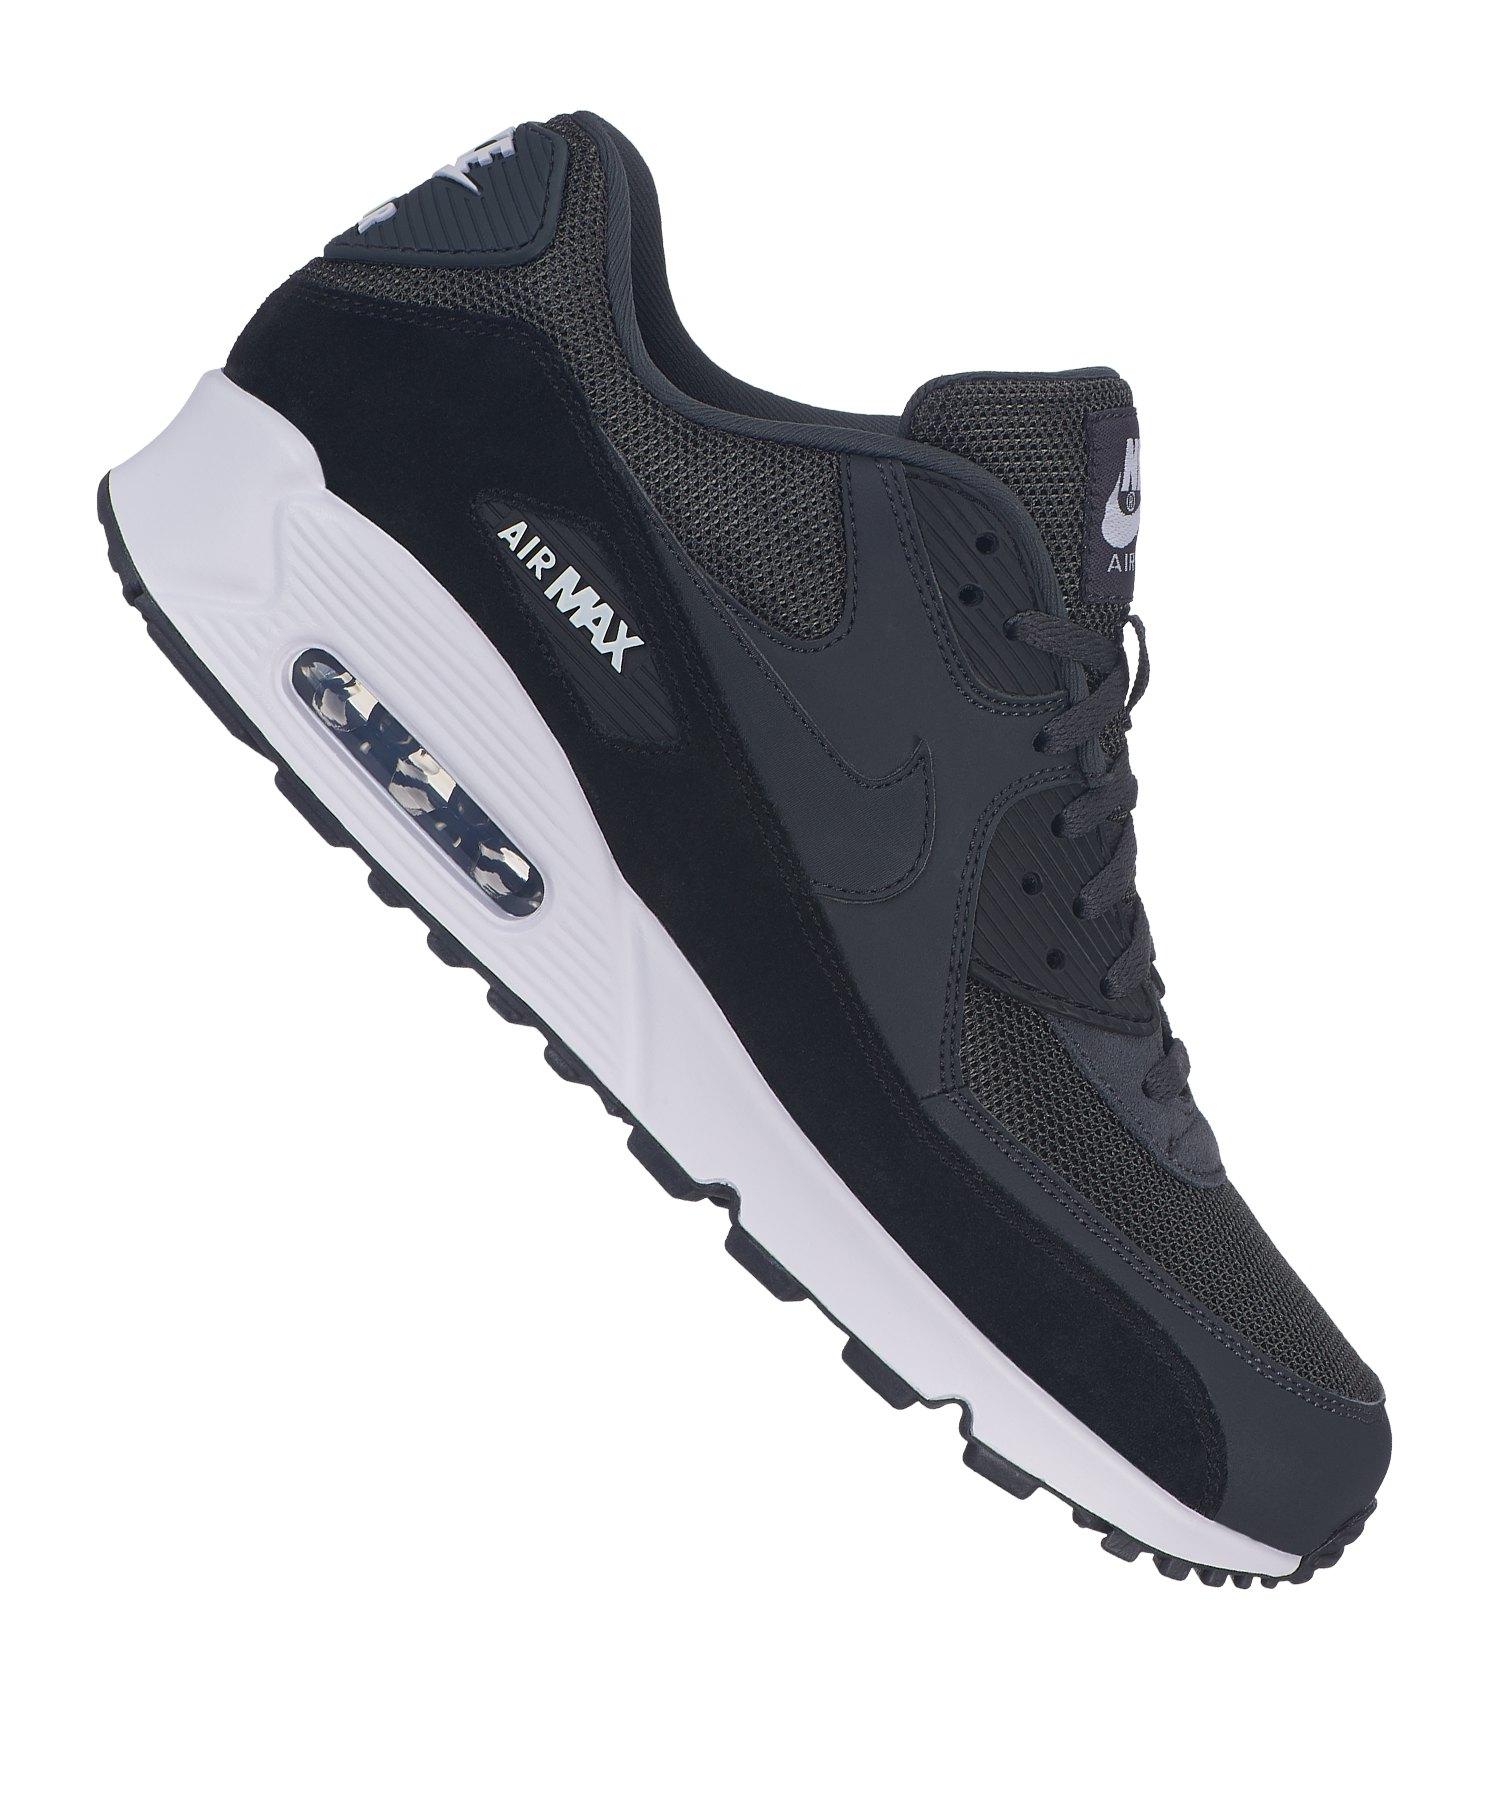 NIKE Air Max 90 Essential Herren Sneaker Schwarz